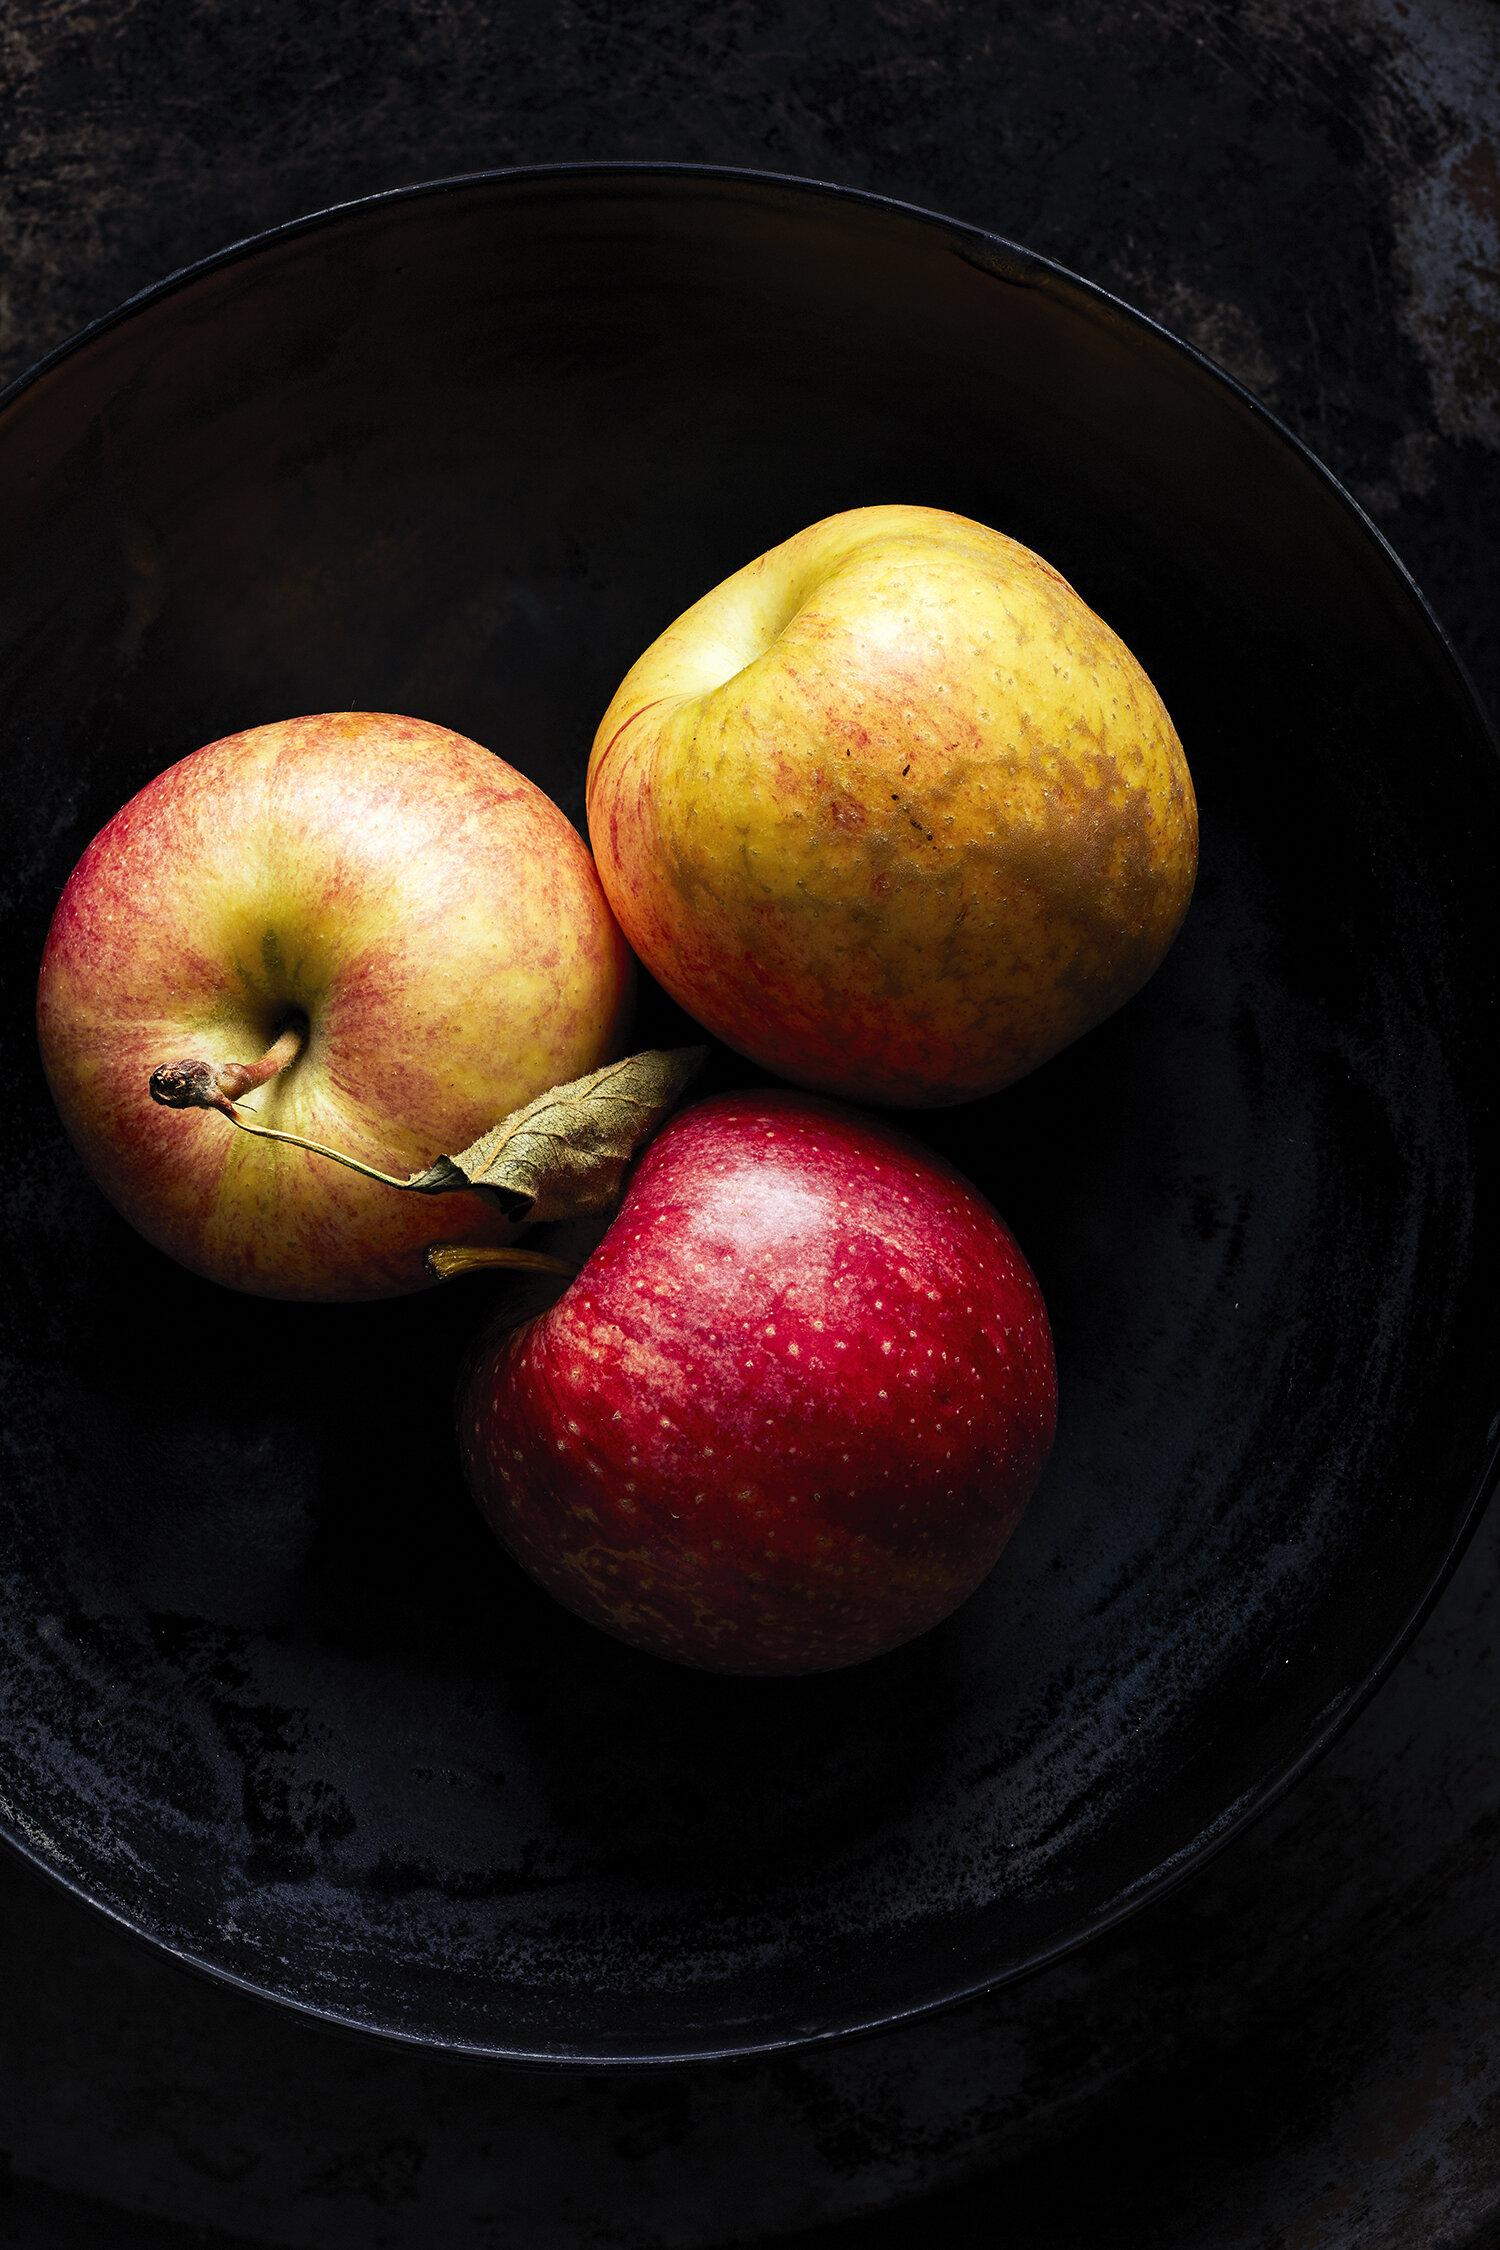 Franco food apples 191003shot01-313022f.jpg